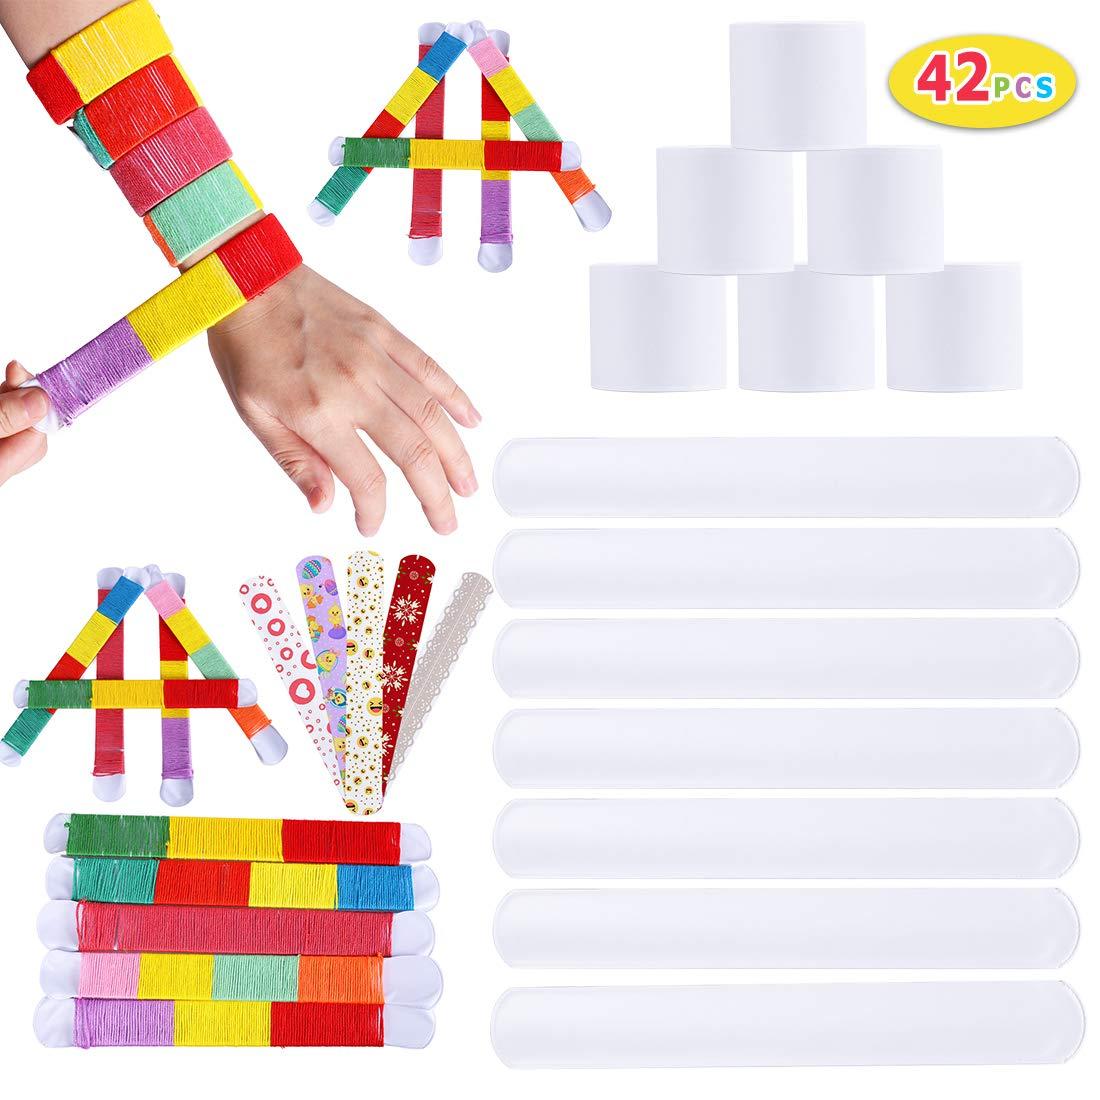 Max Fun 42PCS DIY White Slap Bracelet Bands Party Favors Painting Pat Ring Bracelets DIY Your Own Craft Kit for Kids Boys Girls School Party (Style 1)